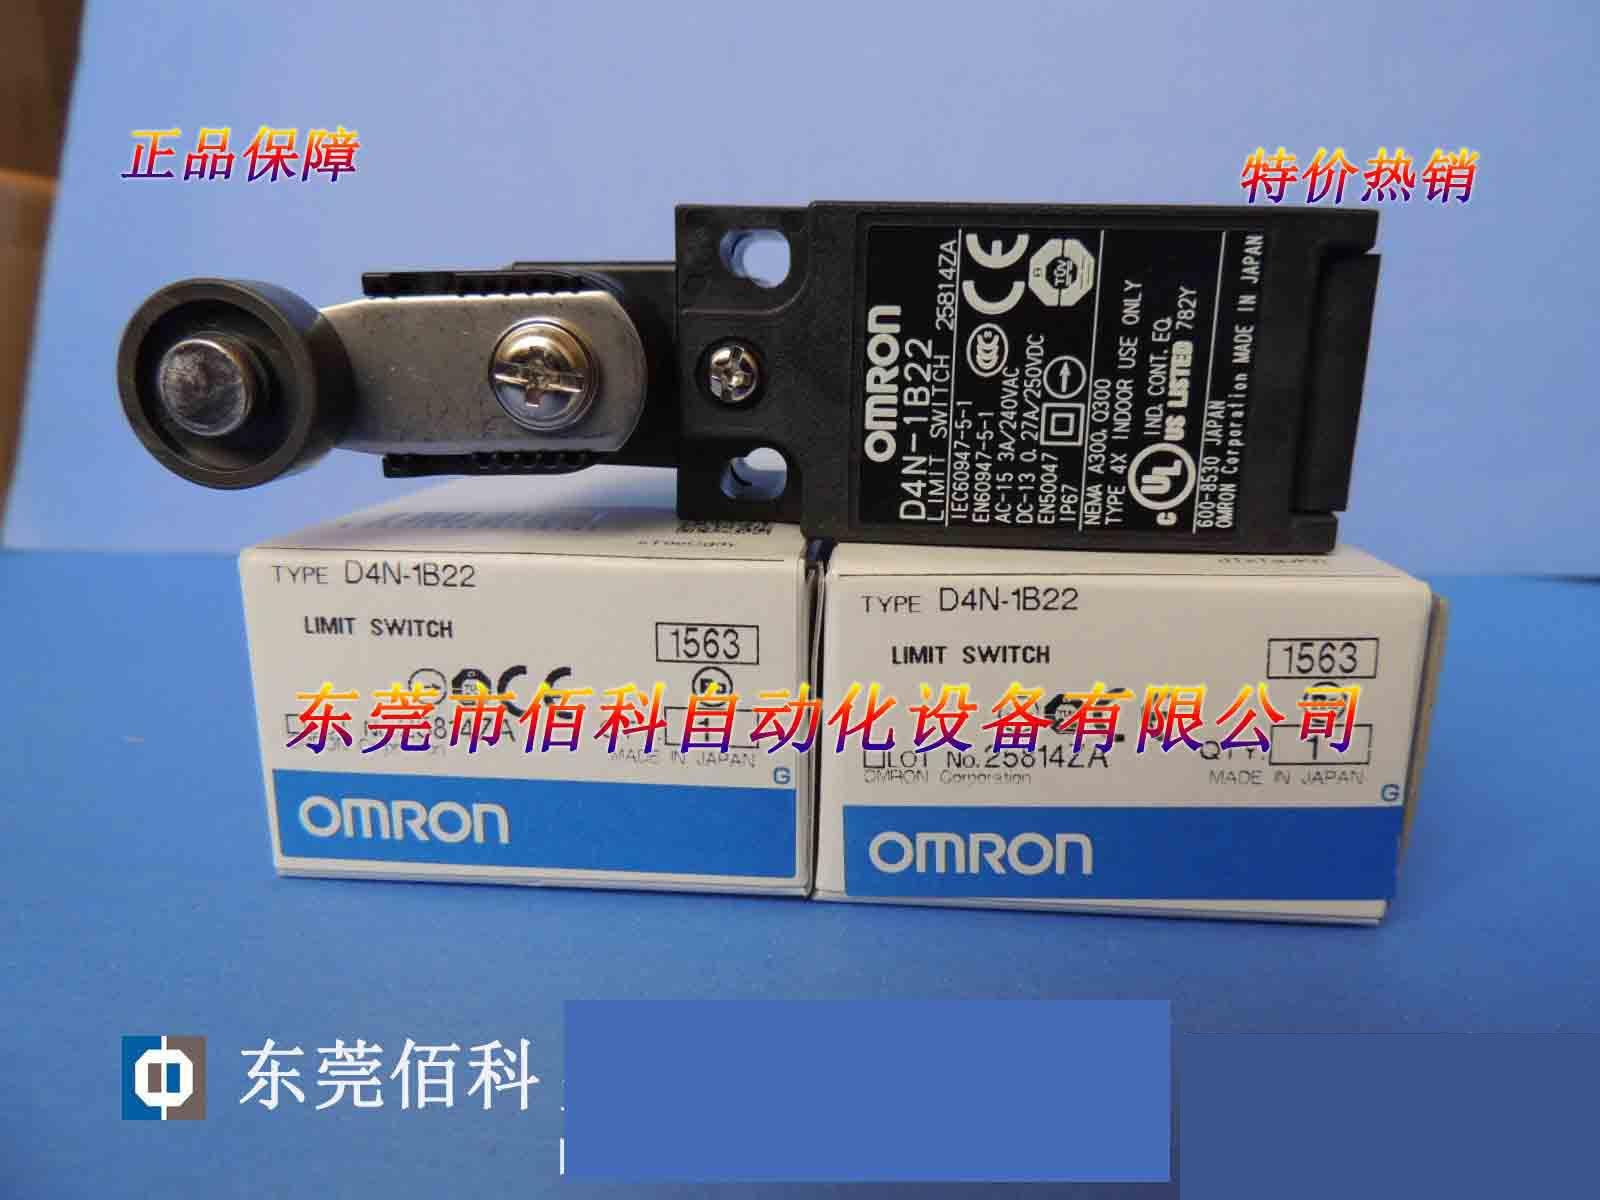 New original OMRON stroke switch D4N-1B22New original OMRON stroke switch D4N-1B22